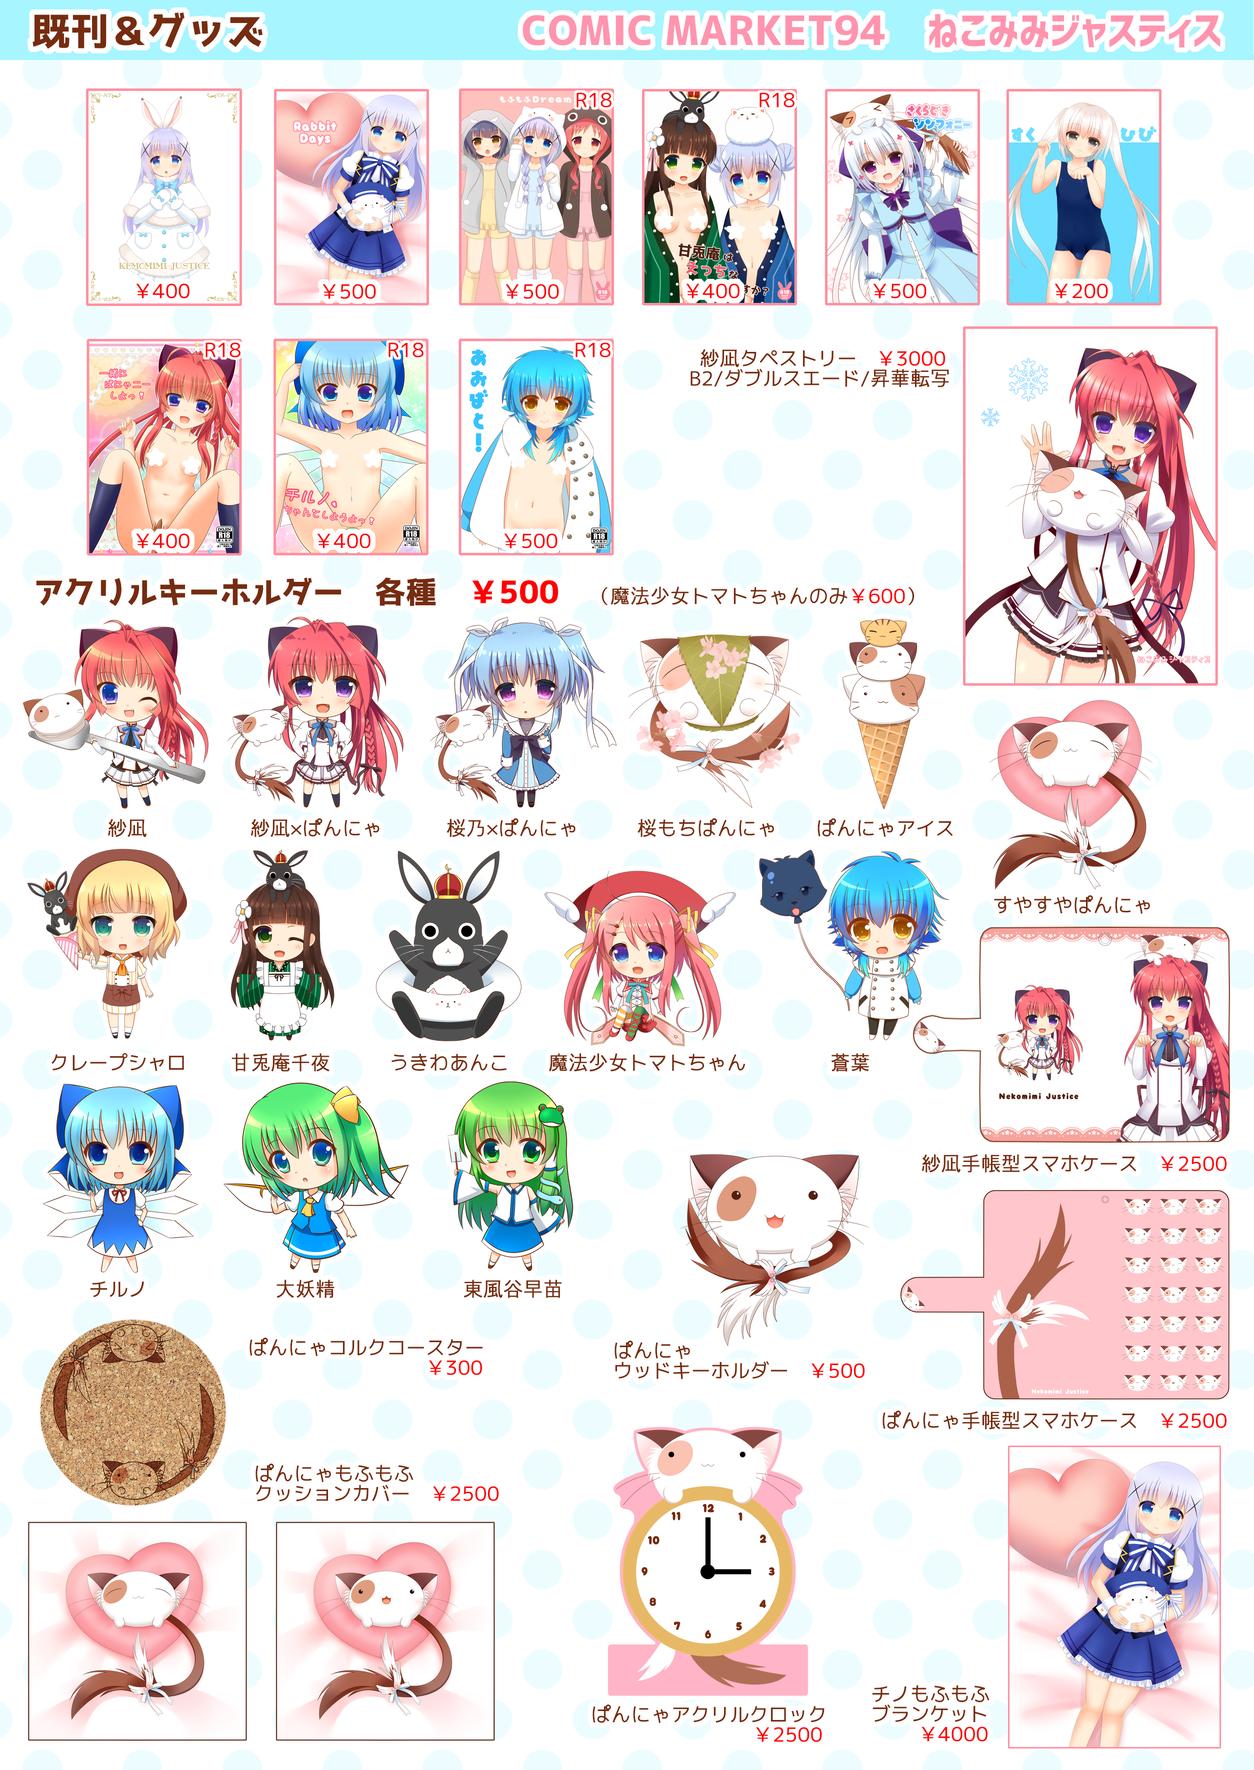 C94_oshinagaki_kikan.png